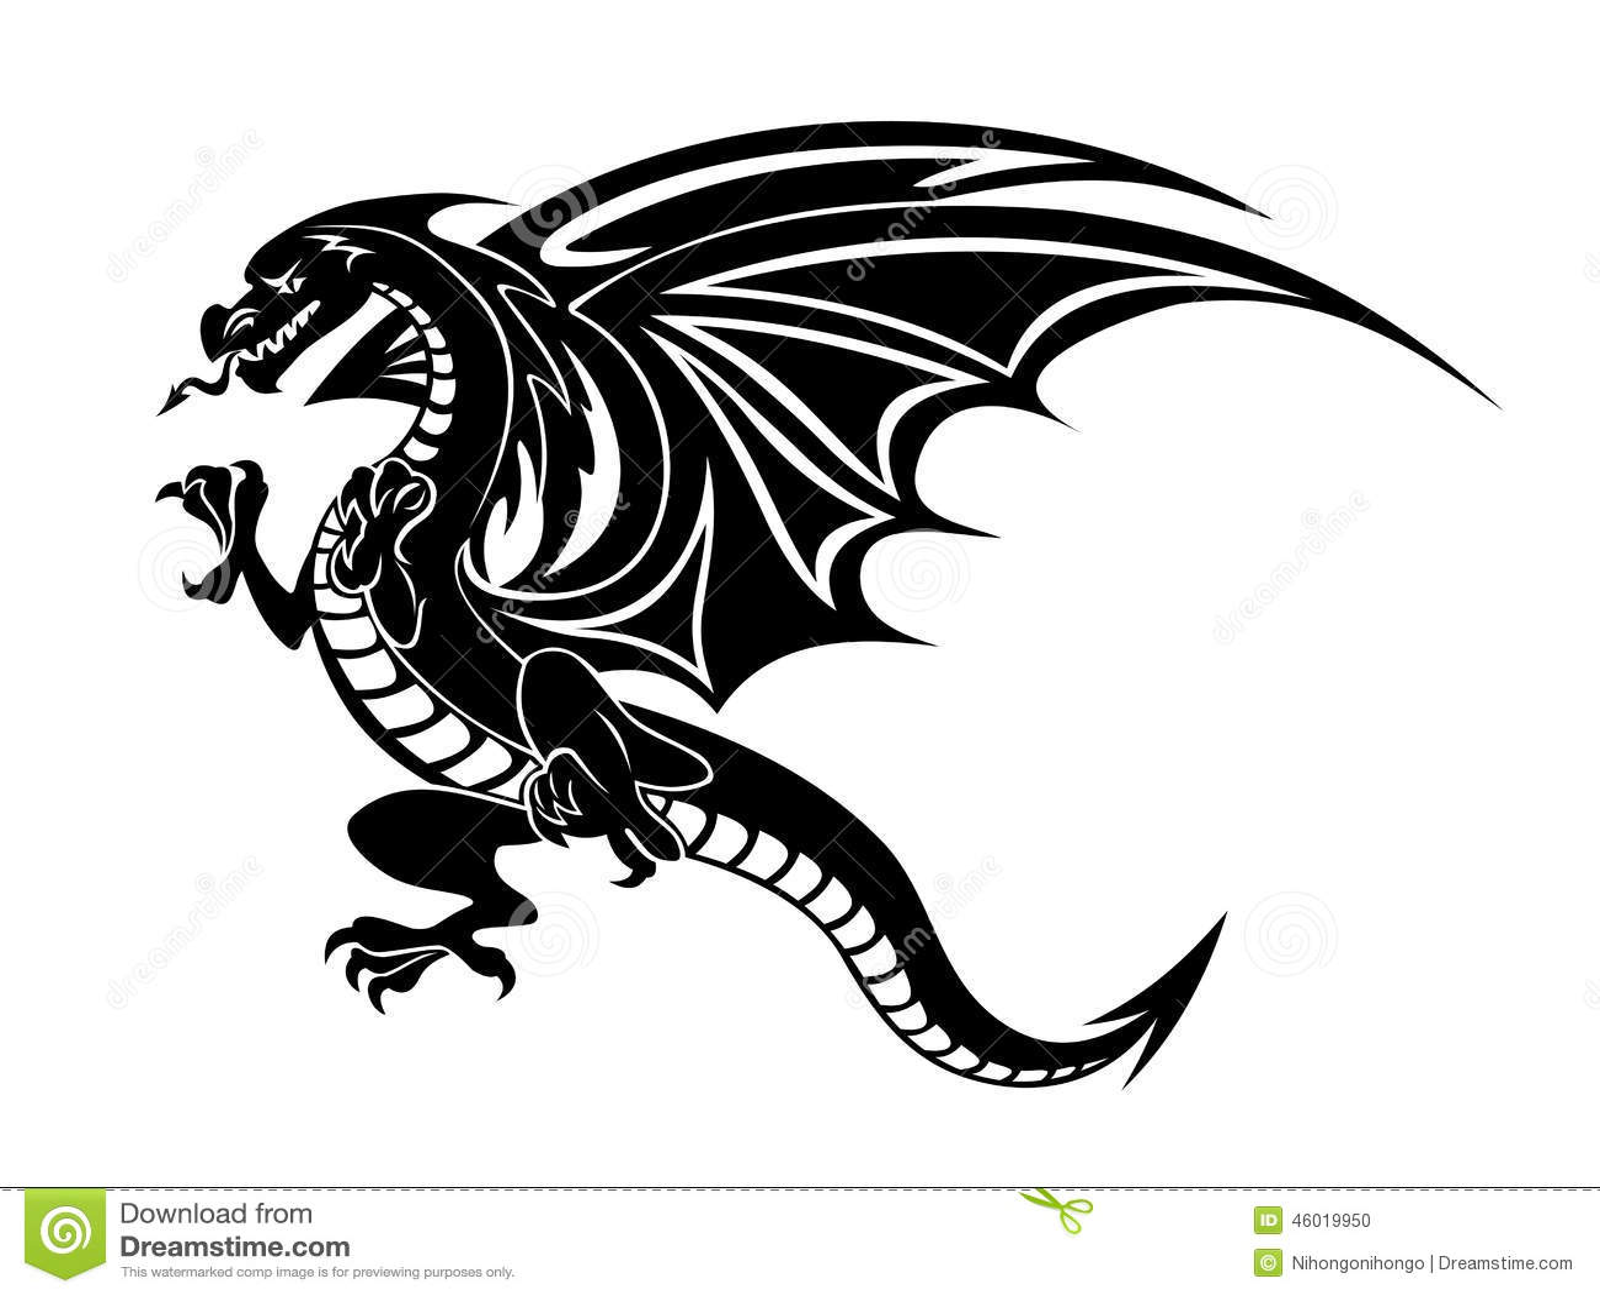 8f7c5bdc47f2f Angry black dragon stock vector. Illustration of design - 46019950